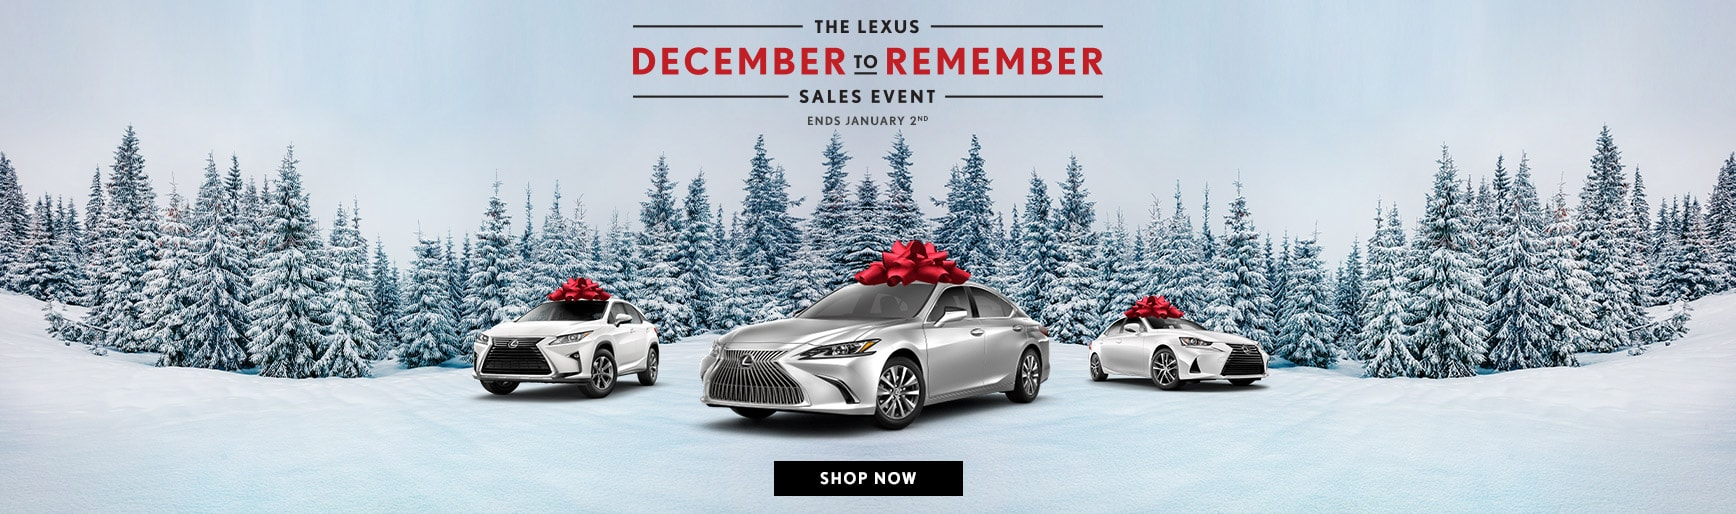 Lexus of Glendale | Lexus Dealer | Lexus Sales Glendale, CA